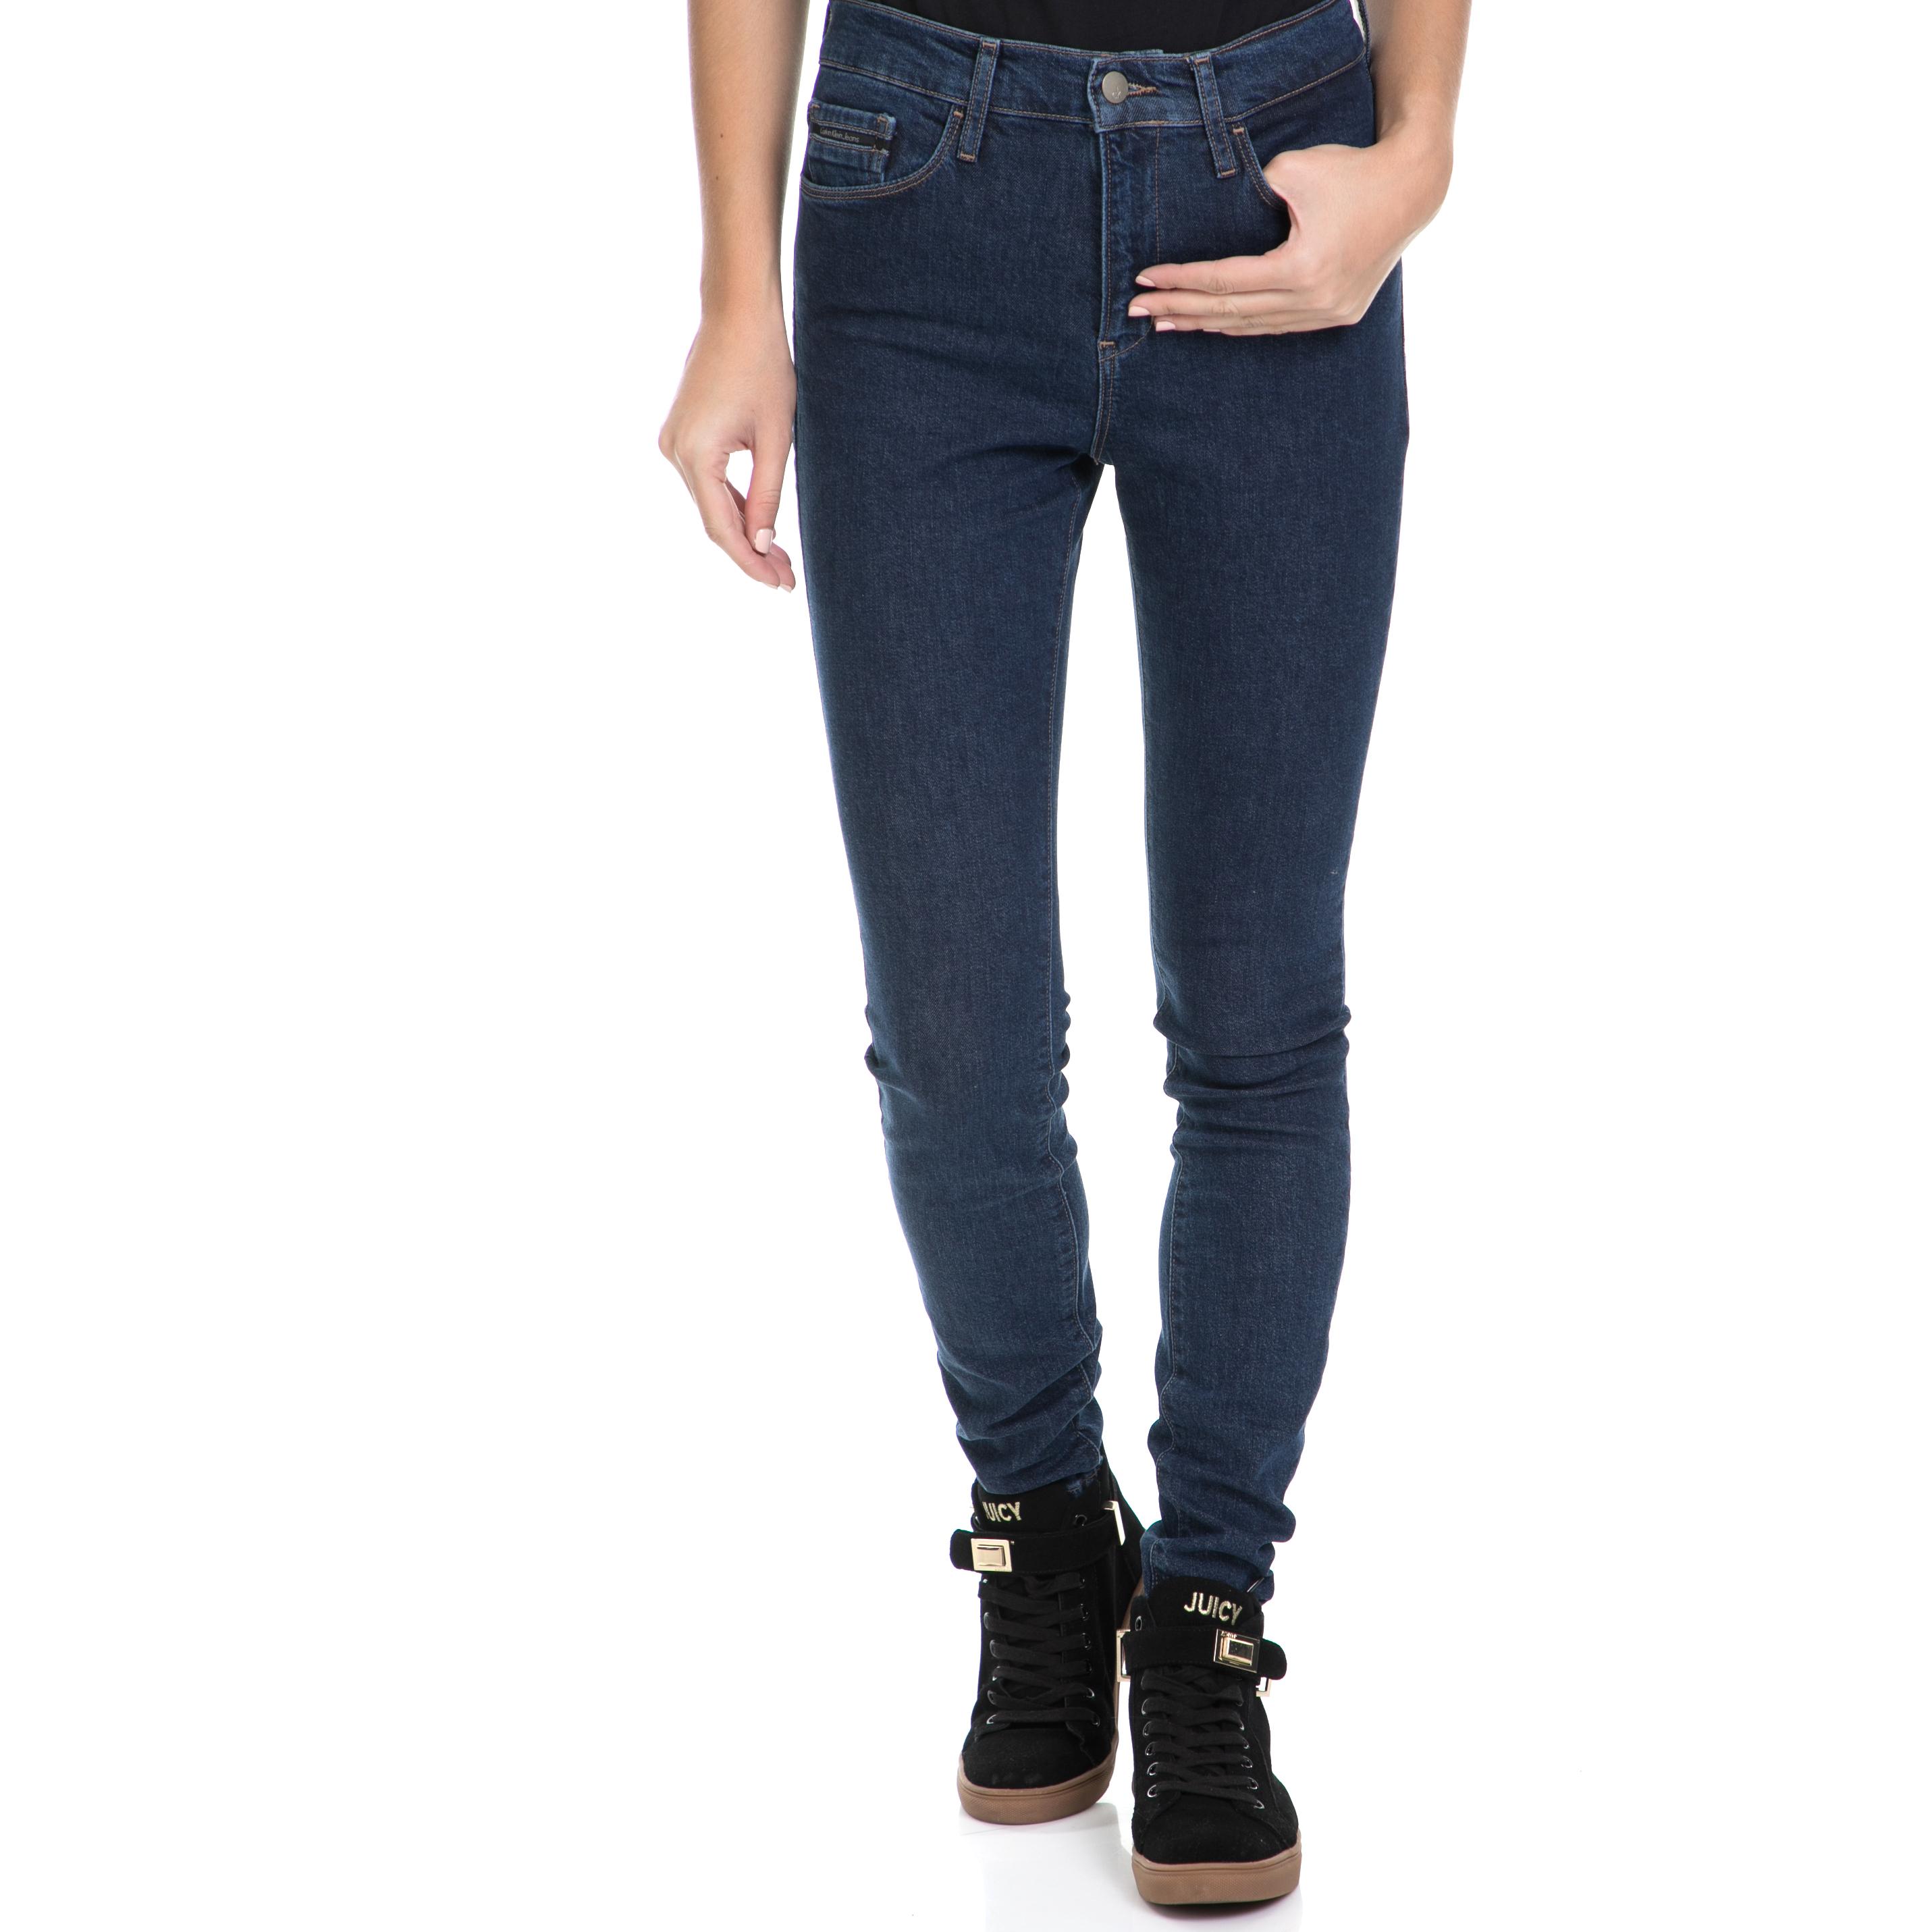 CALVIN KLEIN JEANS - Γυναικείο τζιν παντελόνι High Rise Skinny - Bice Dark μπλε γυναικεία ρούχα τζίν skinny